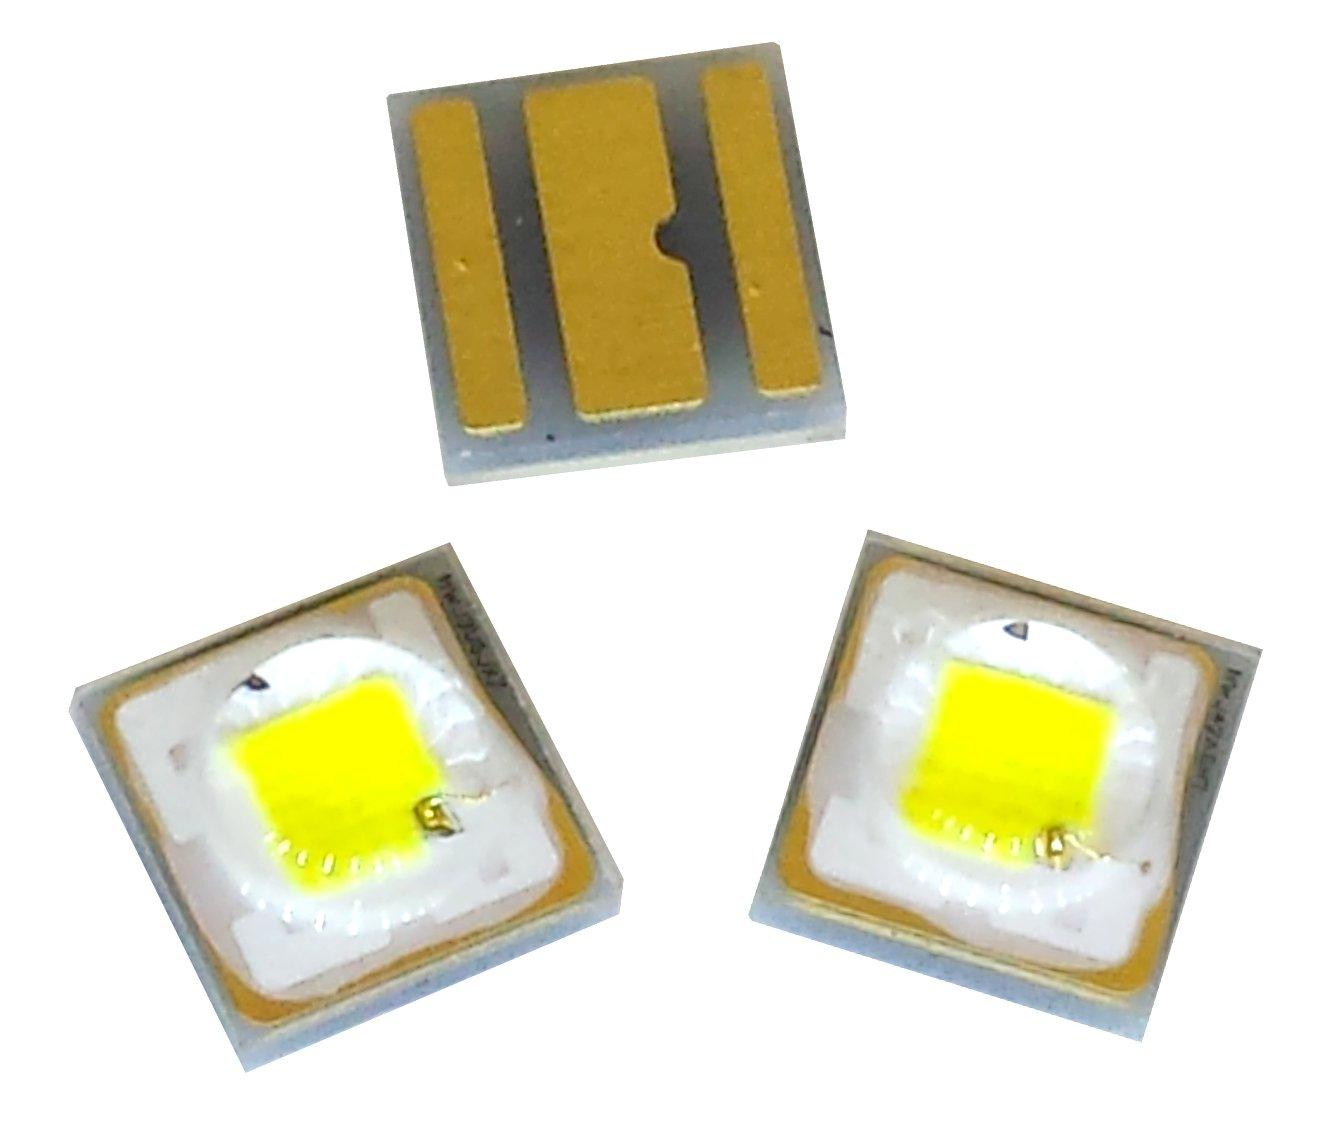 PC  1.0/W SMT Bo/îtier Lot de 10/oslon/® SSL 150/LED 4000/K Nautral Blanc cri70/LCW cqdp